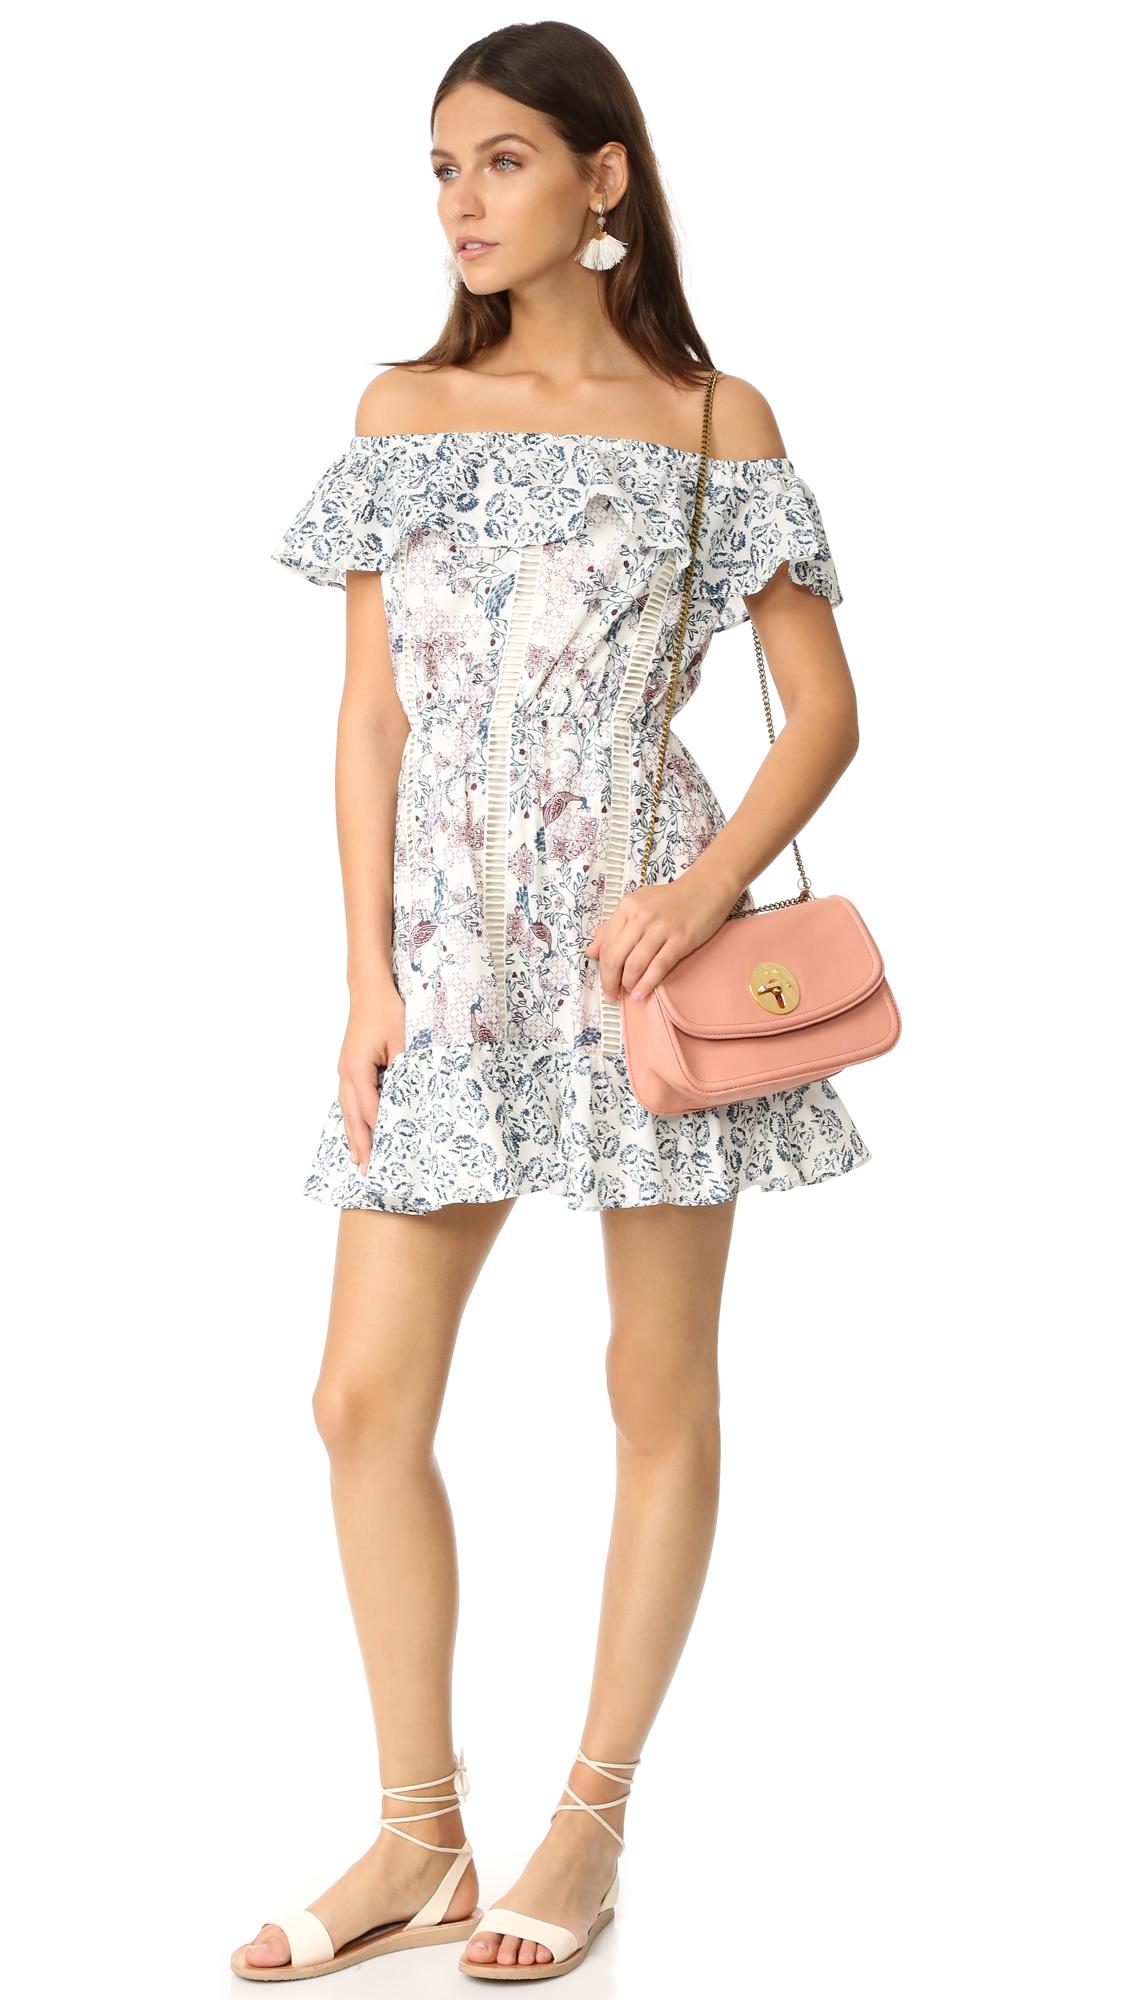 tularosa taylor dress shopbop